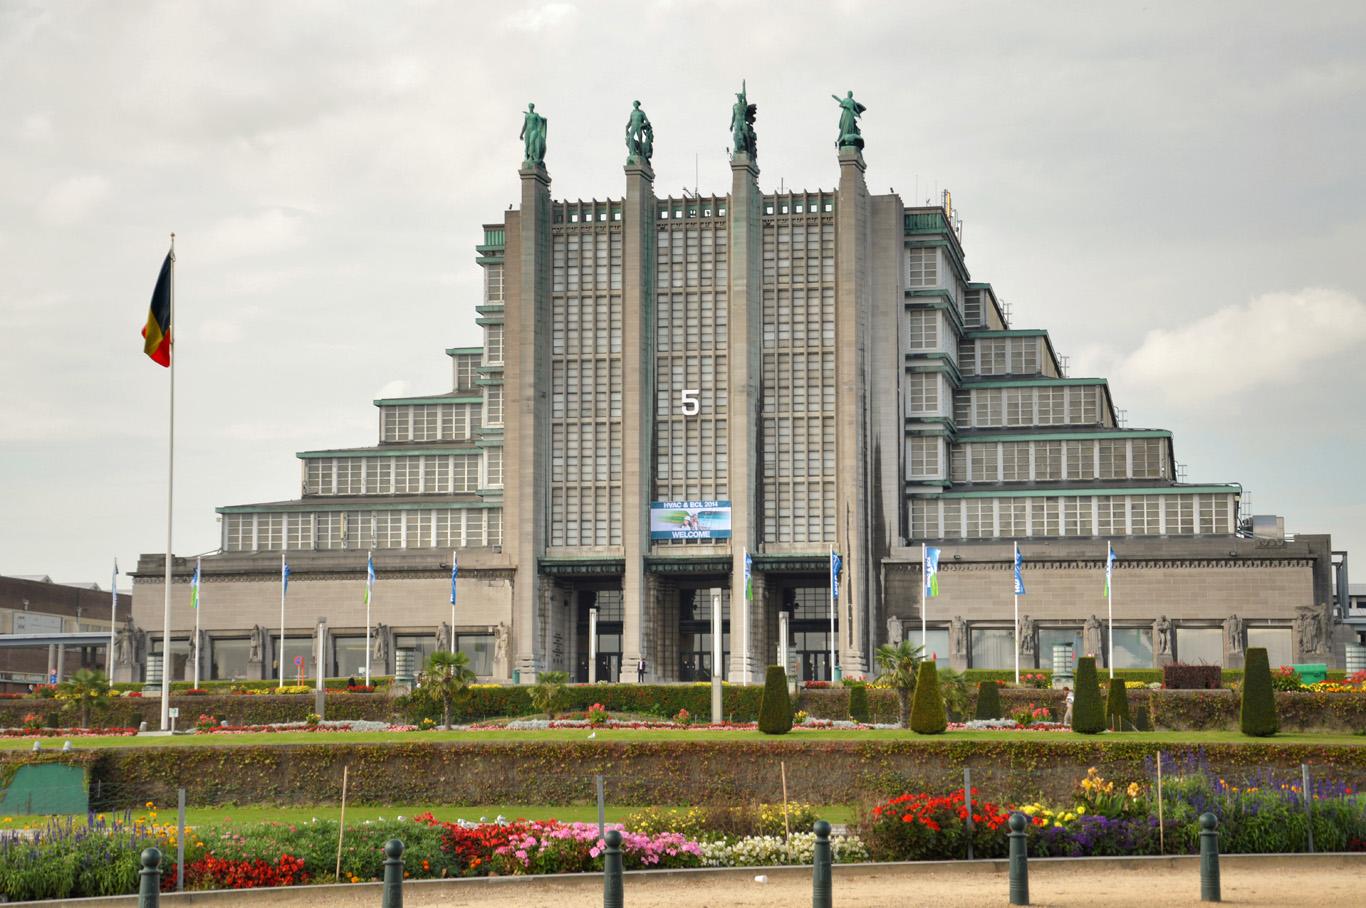 Expo building